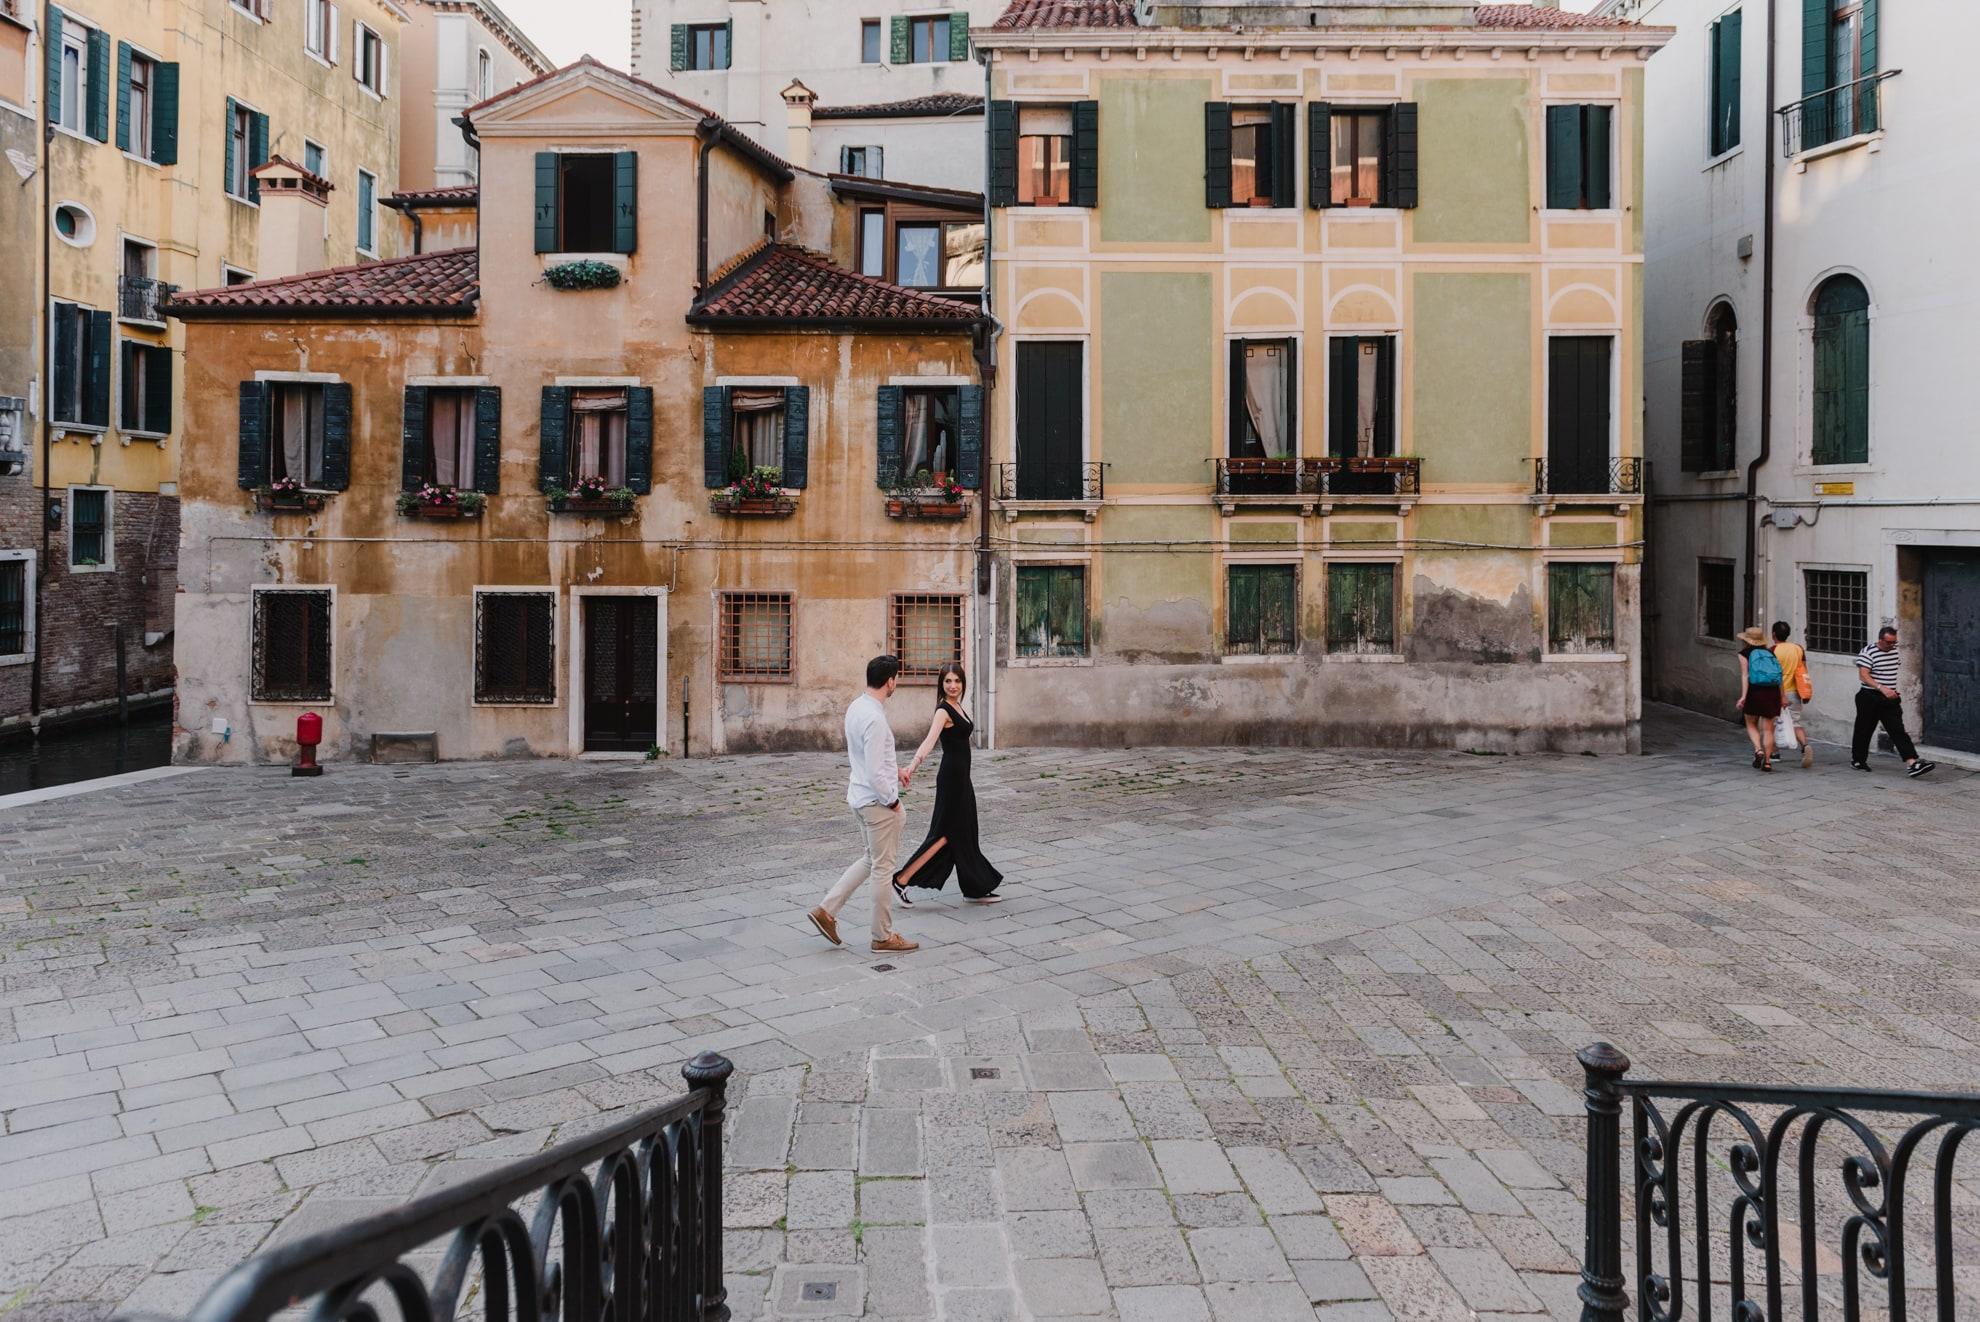 engagement venice venezia proposal proposta matrimonio fidanzamento irene pollacchi fotografa 8